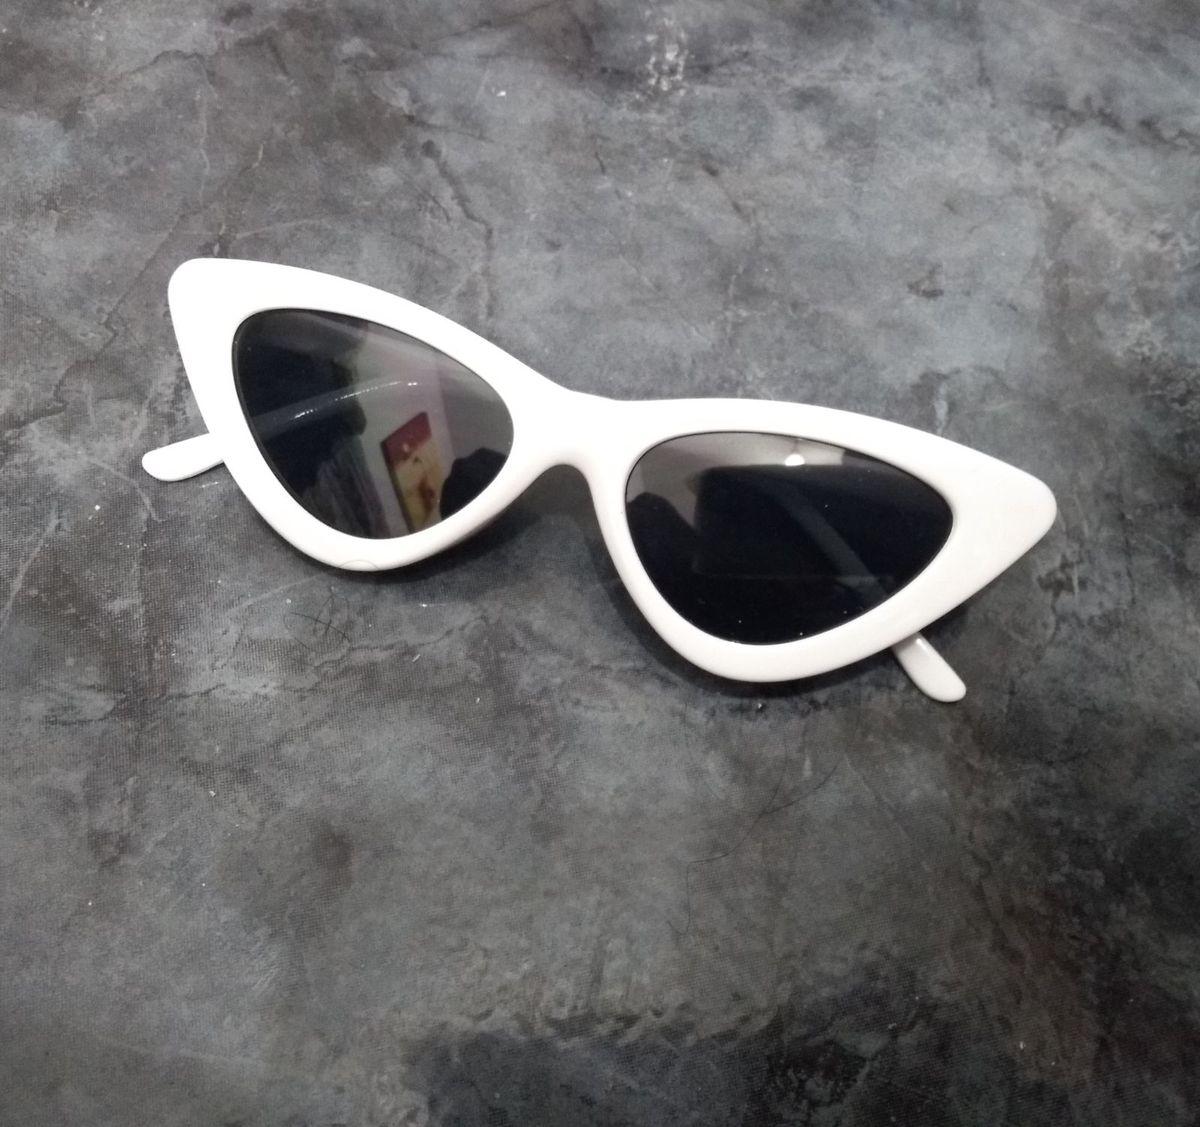 bdfb04b346469 óculos gatinho branco - óculos sem-marca.  Czm6ly9wag90b3muzw5qb2vplmnvbs5ici9wcm9kdwn0cy81mjkymdq2lzdinze2ntk3nwmyndq2nmewywuyn2qxmtjjognmzjzhlmpwzw  ...